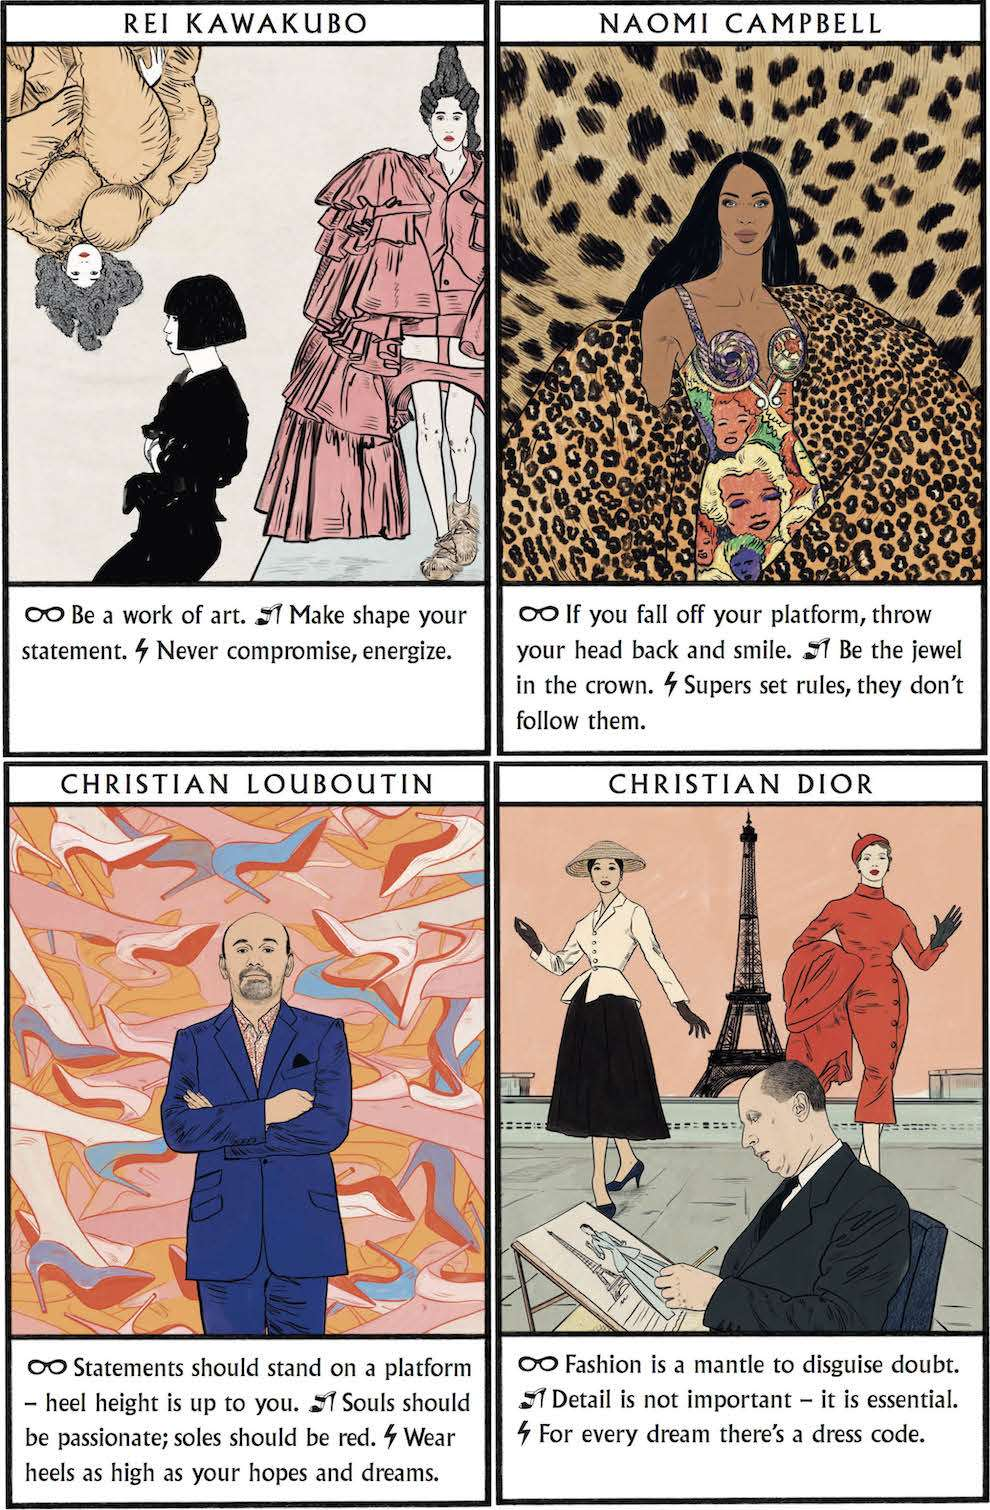 Anna Higgie, Pencil illustration of famous clothe designer